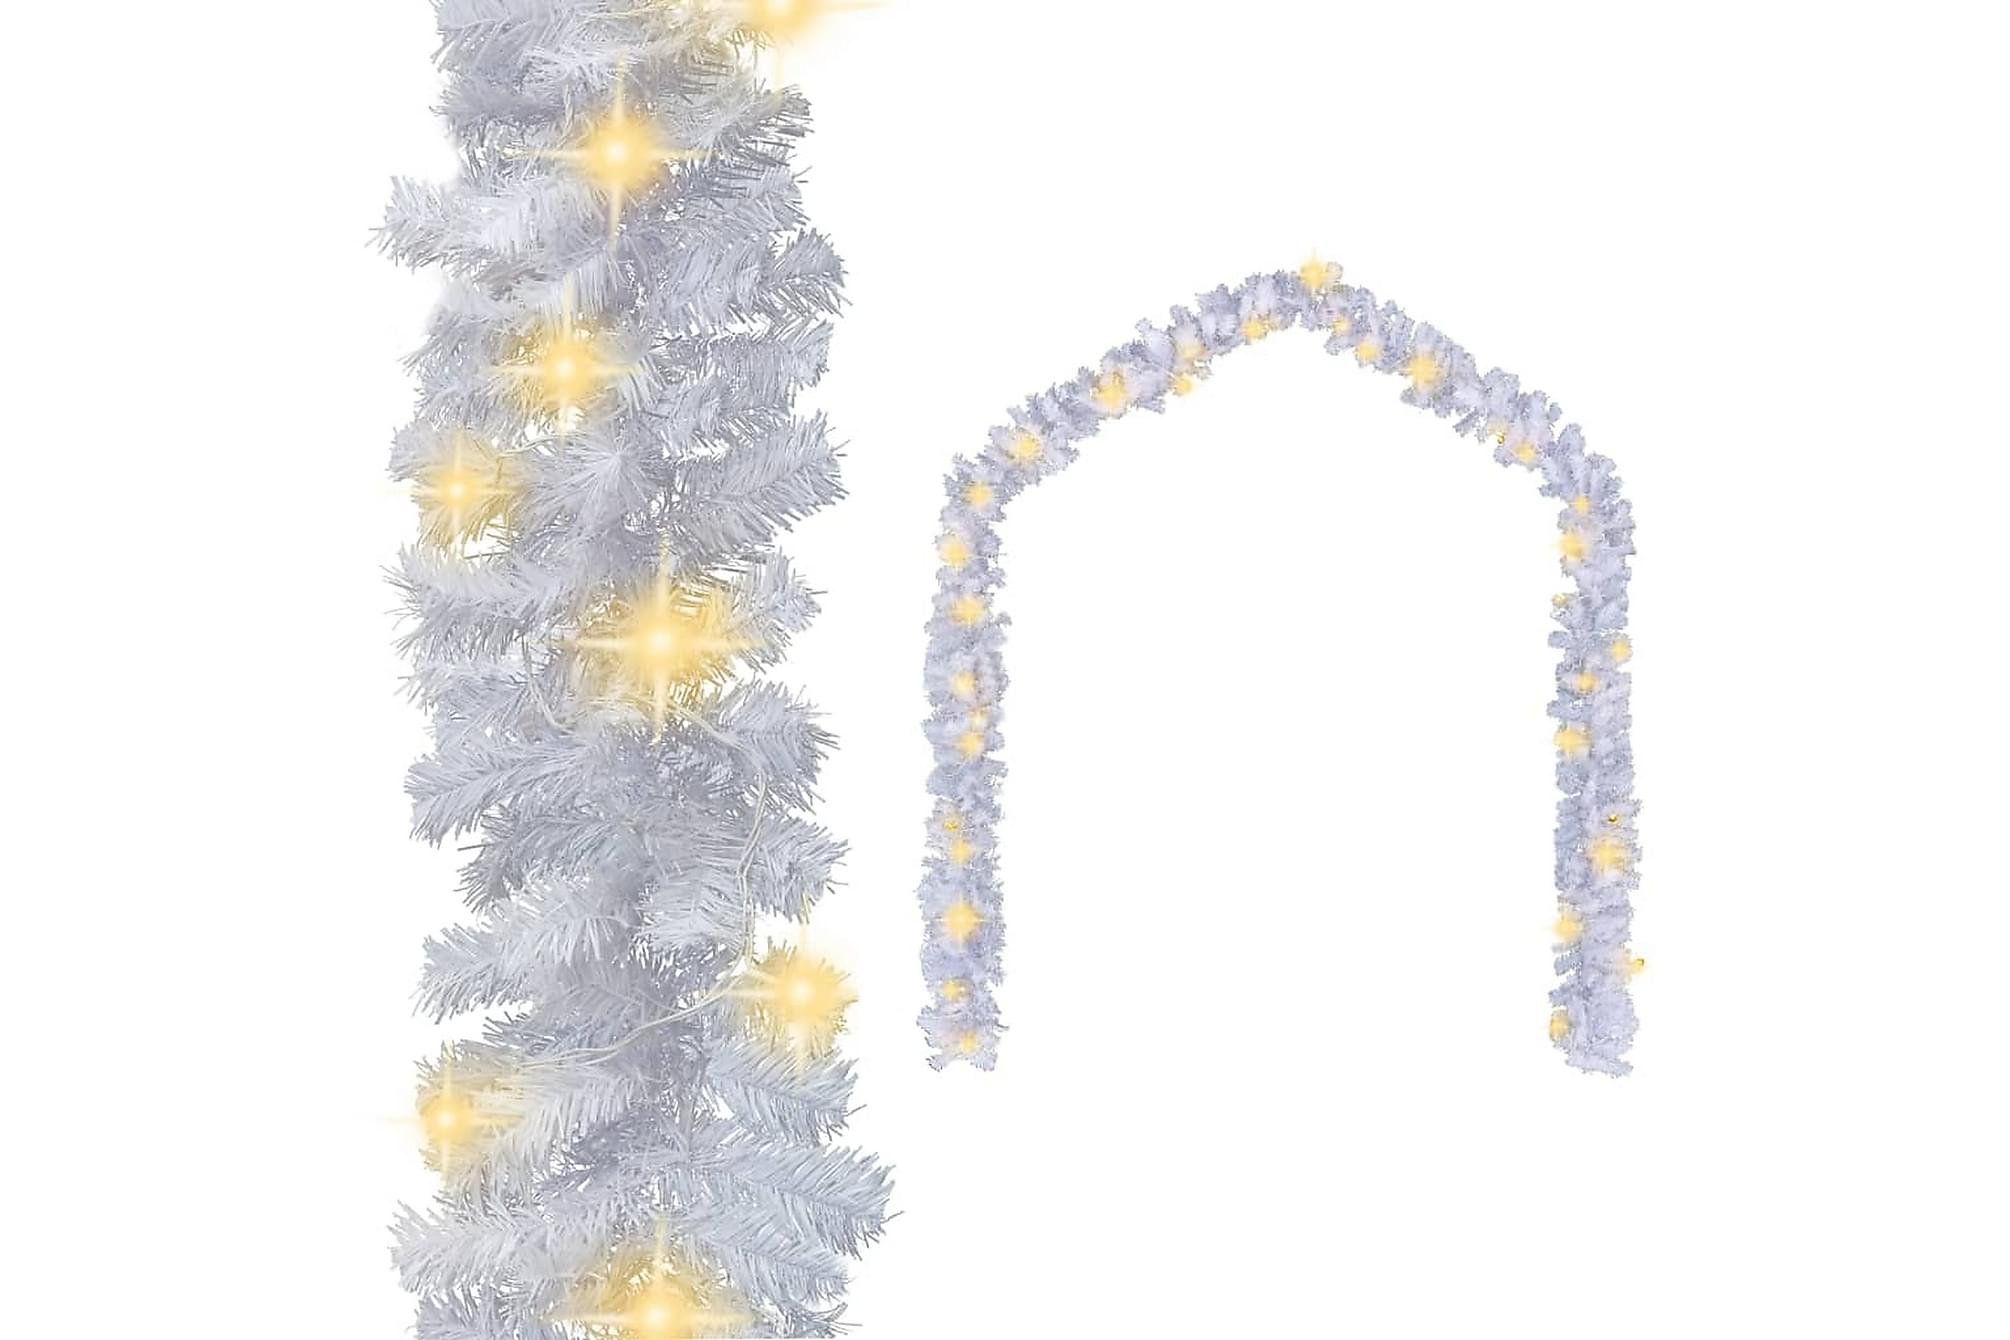 Julgirlang med LED-lampor 5 m vit, Julpynt & juldekoration